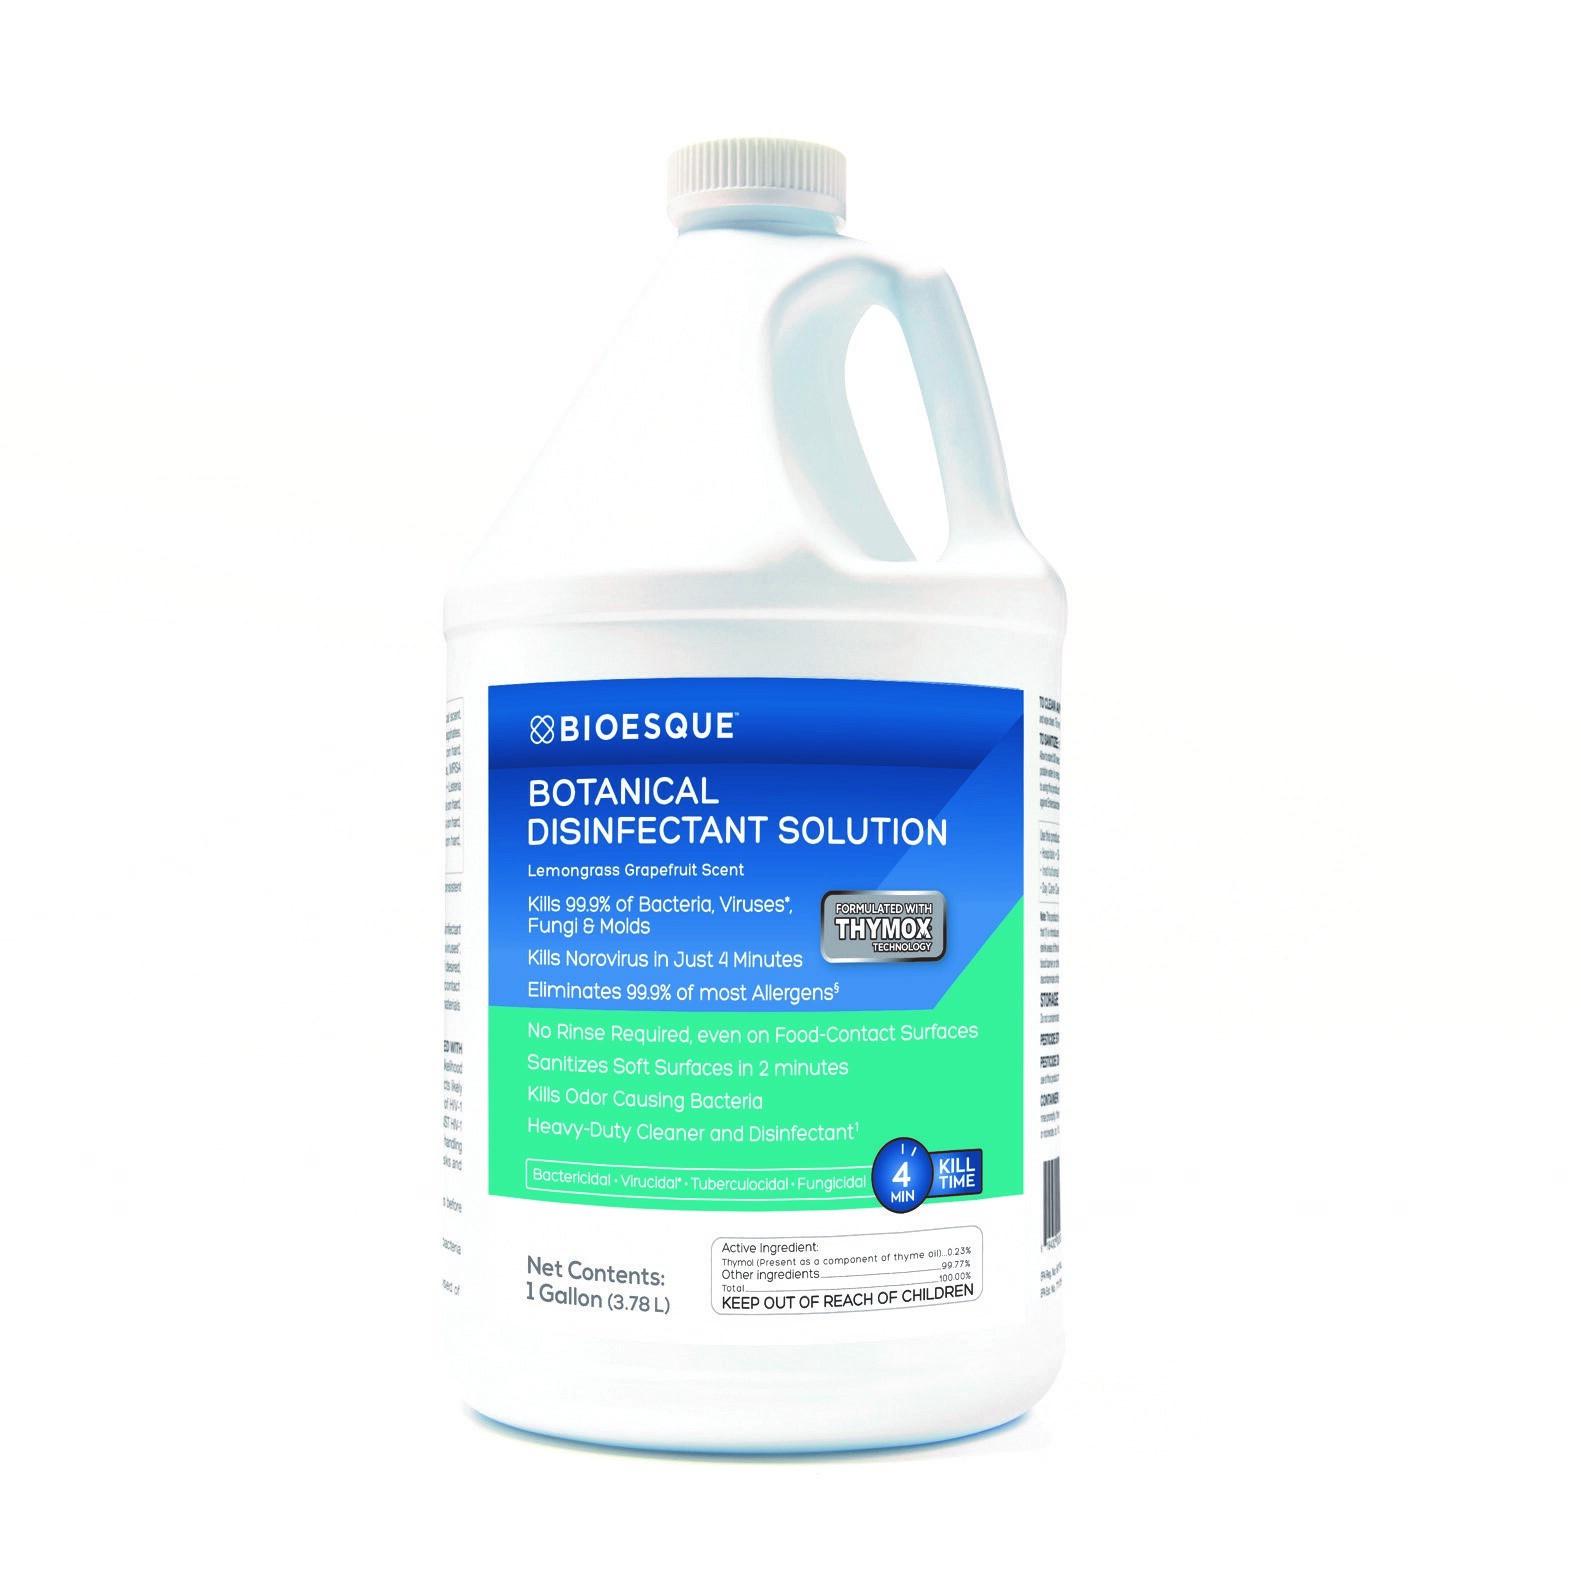 Bioesque Botanical Disinfectant Solution BBSD1G